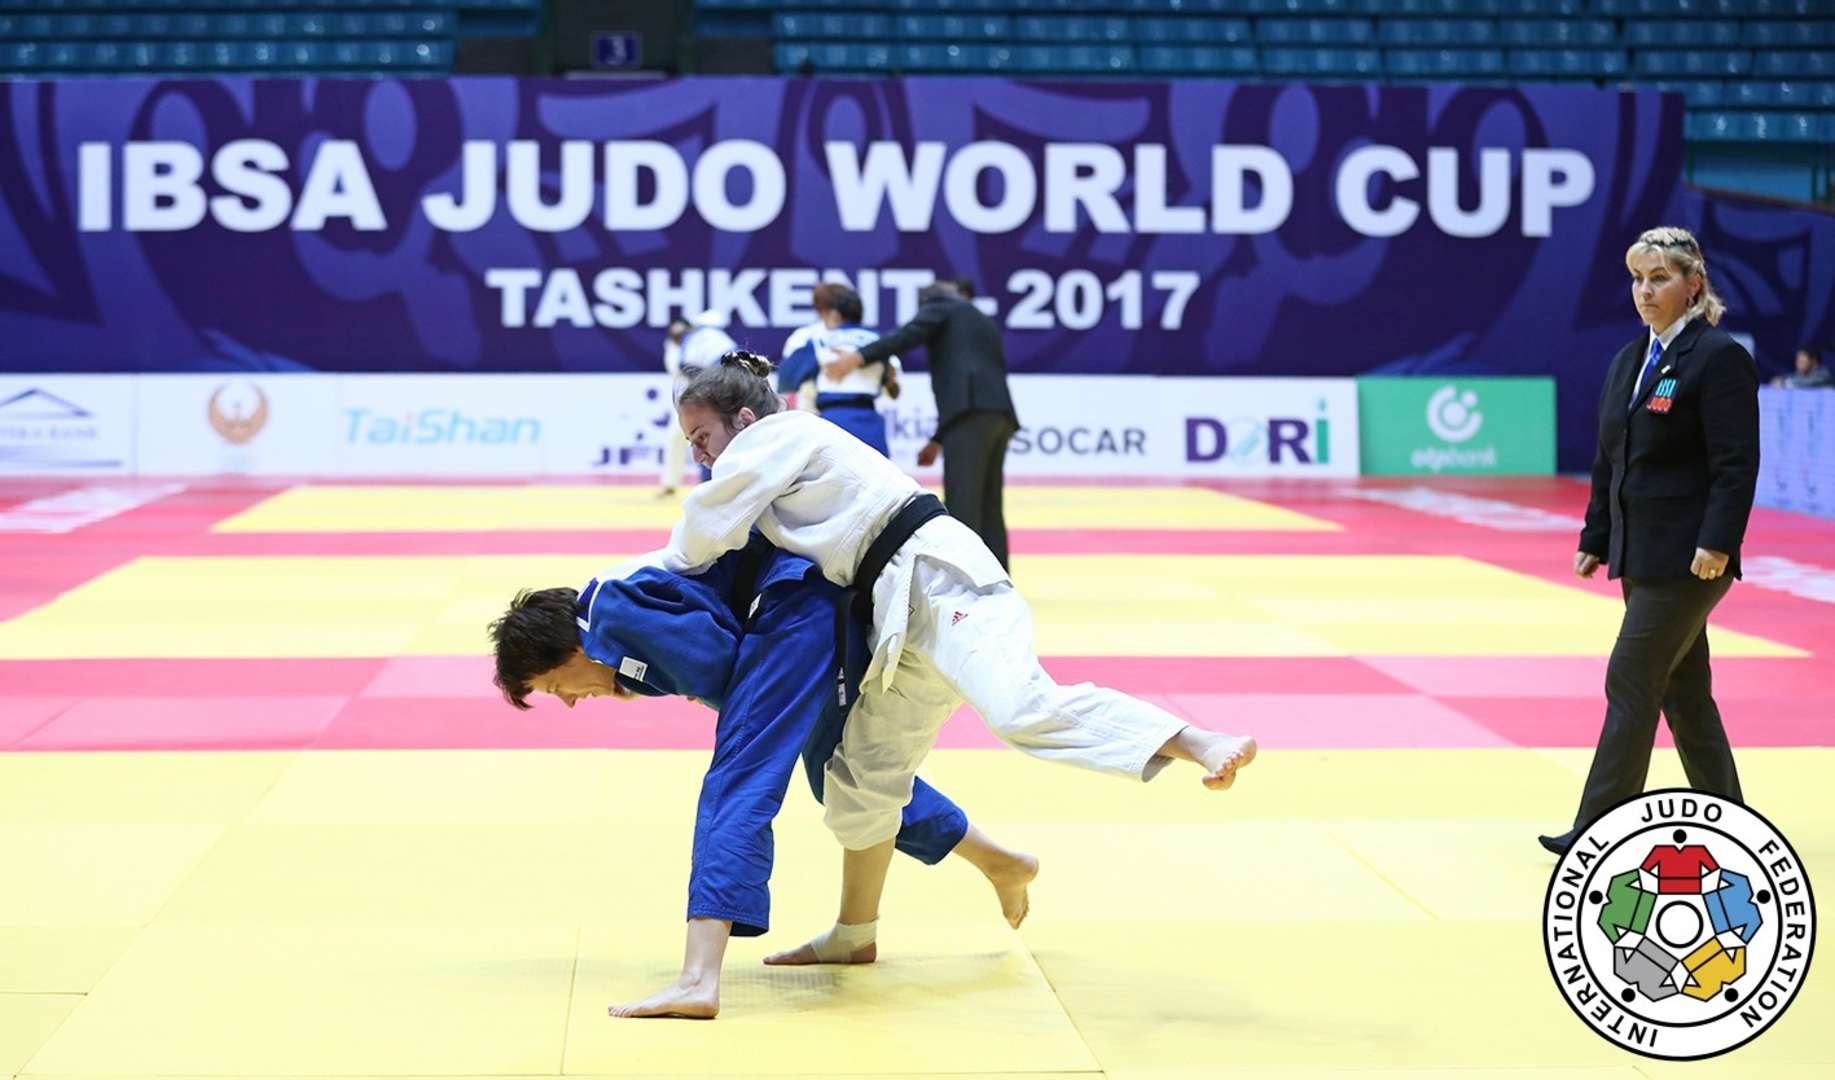 IBSA World Cup, Tashkent 2017 – RESULTS / IJF org